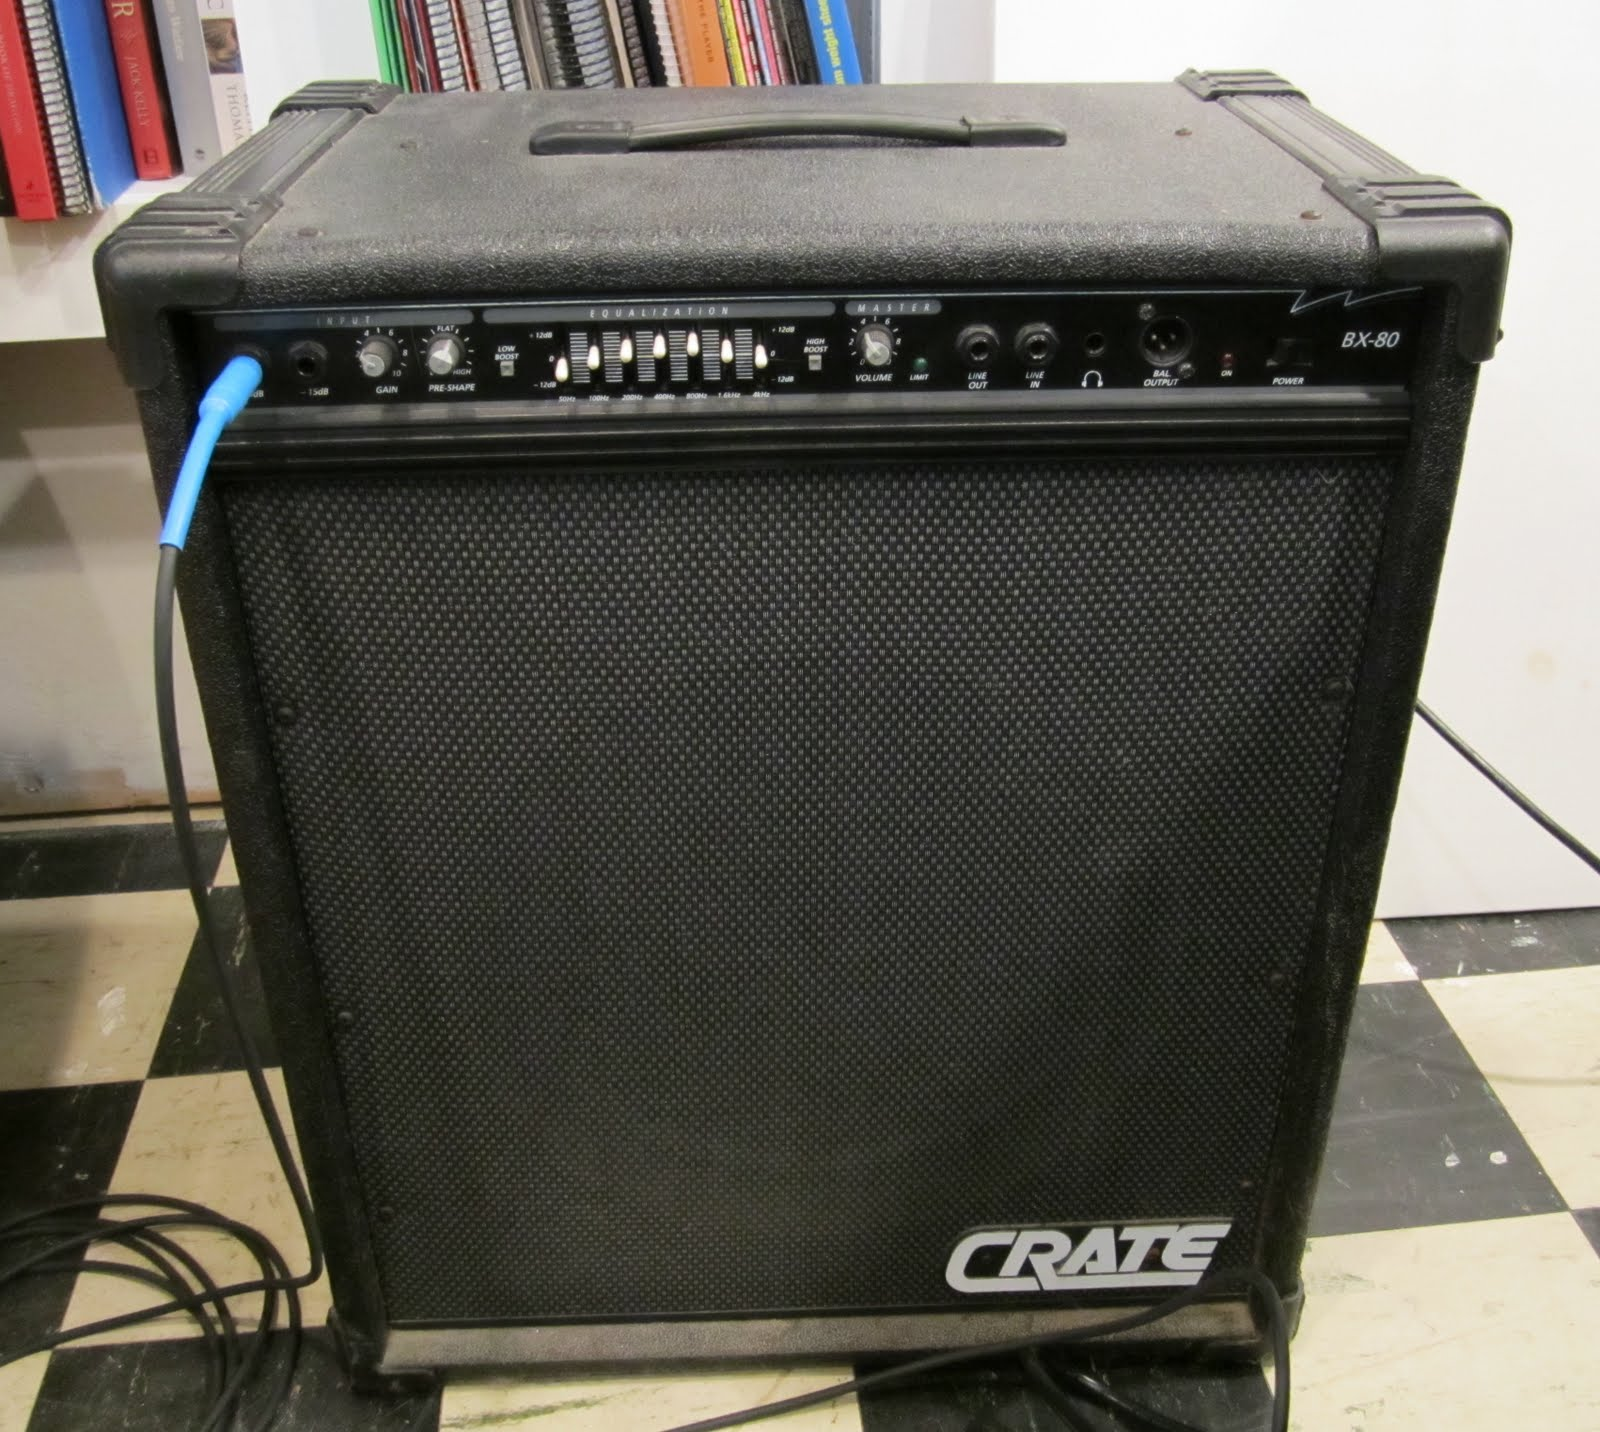 crate bx 80 bx80 bass amplifier combo vinyl amp cover p n crat105. Black Bedroom Furniture Sets. Home Design Ideas